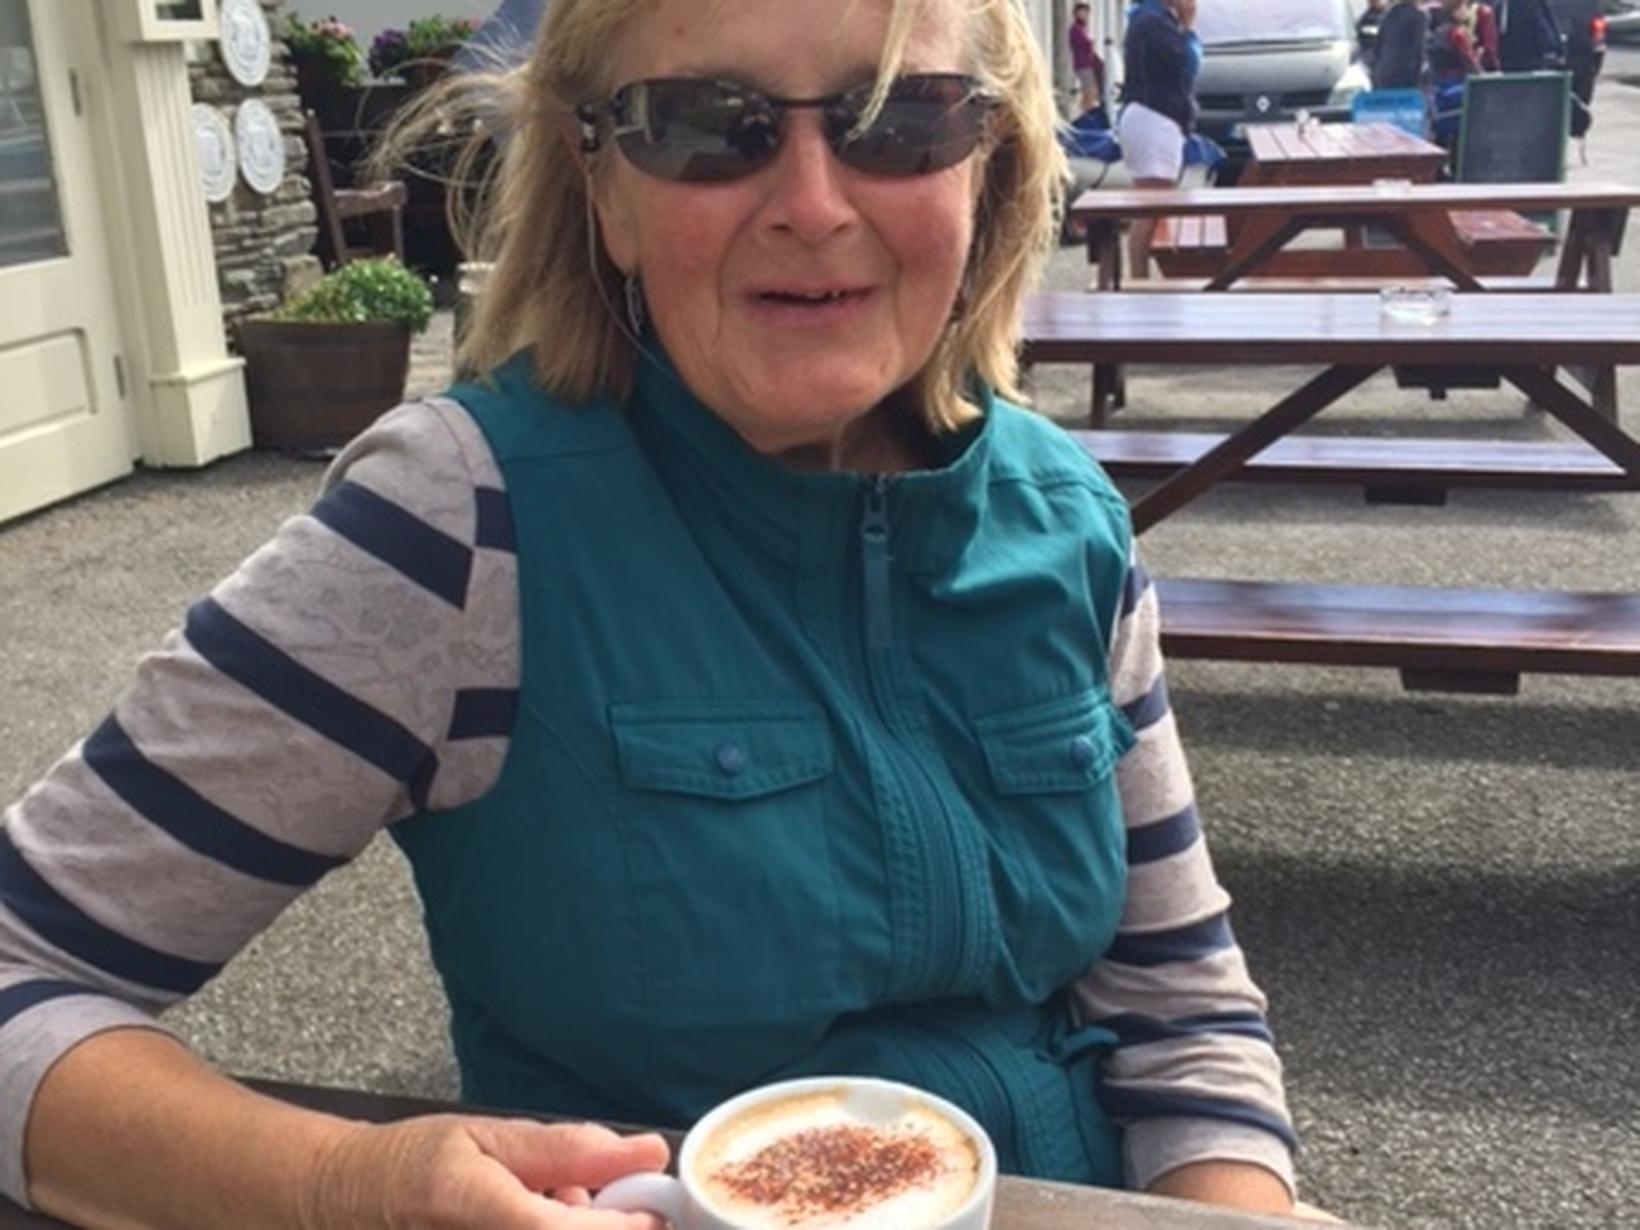 Ann from Clonakilty, Ireland